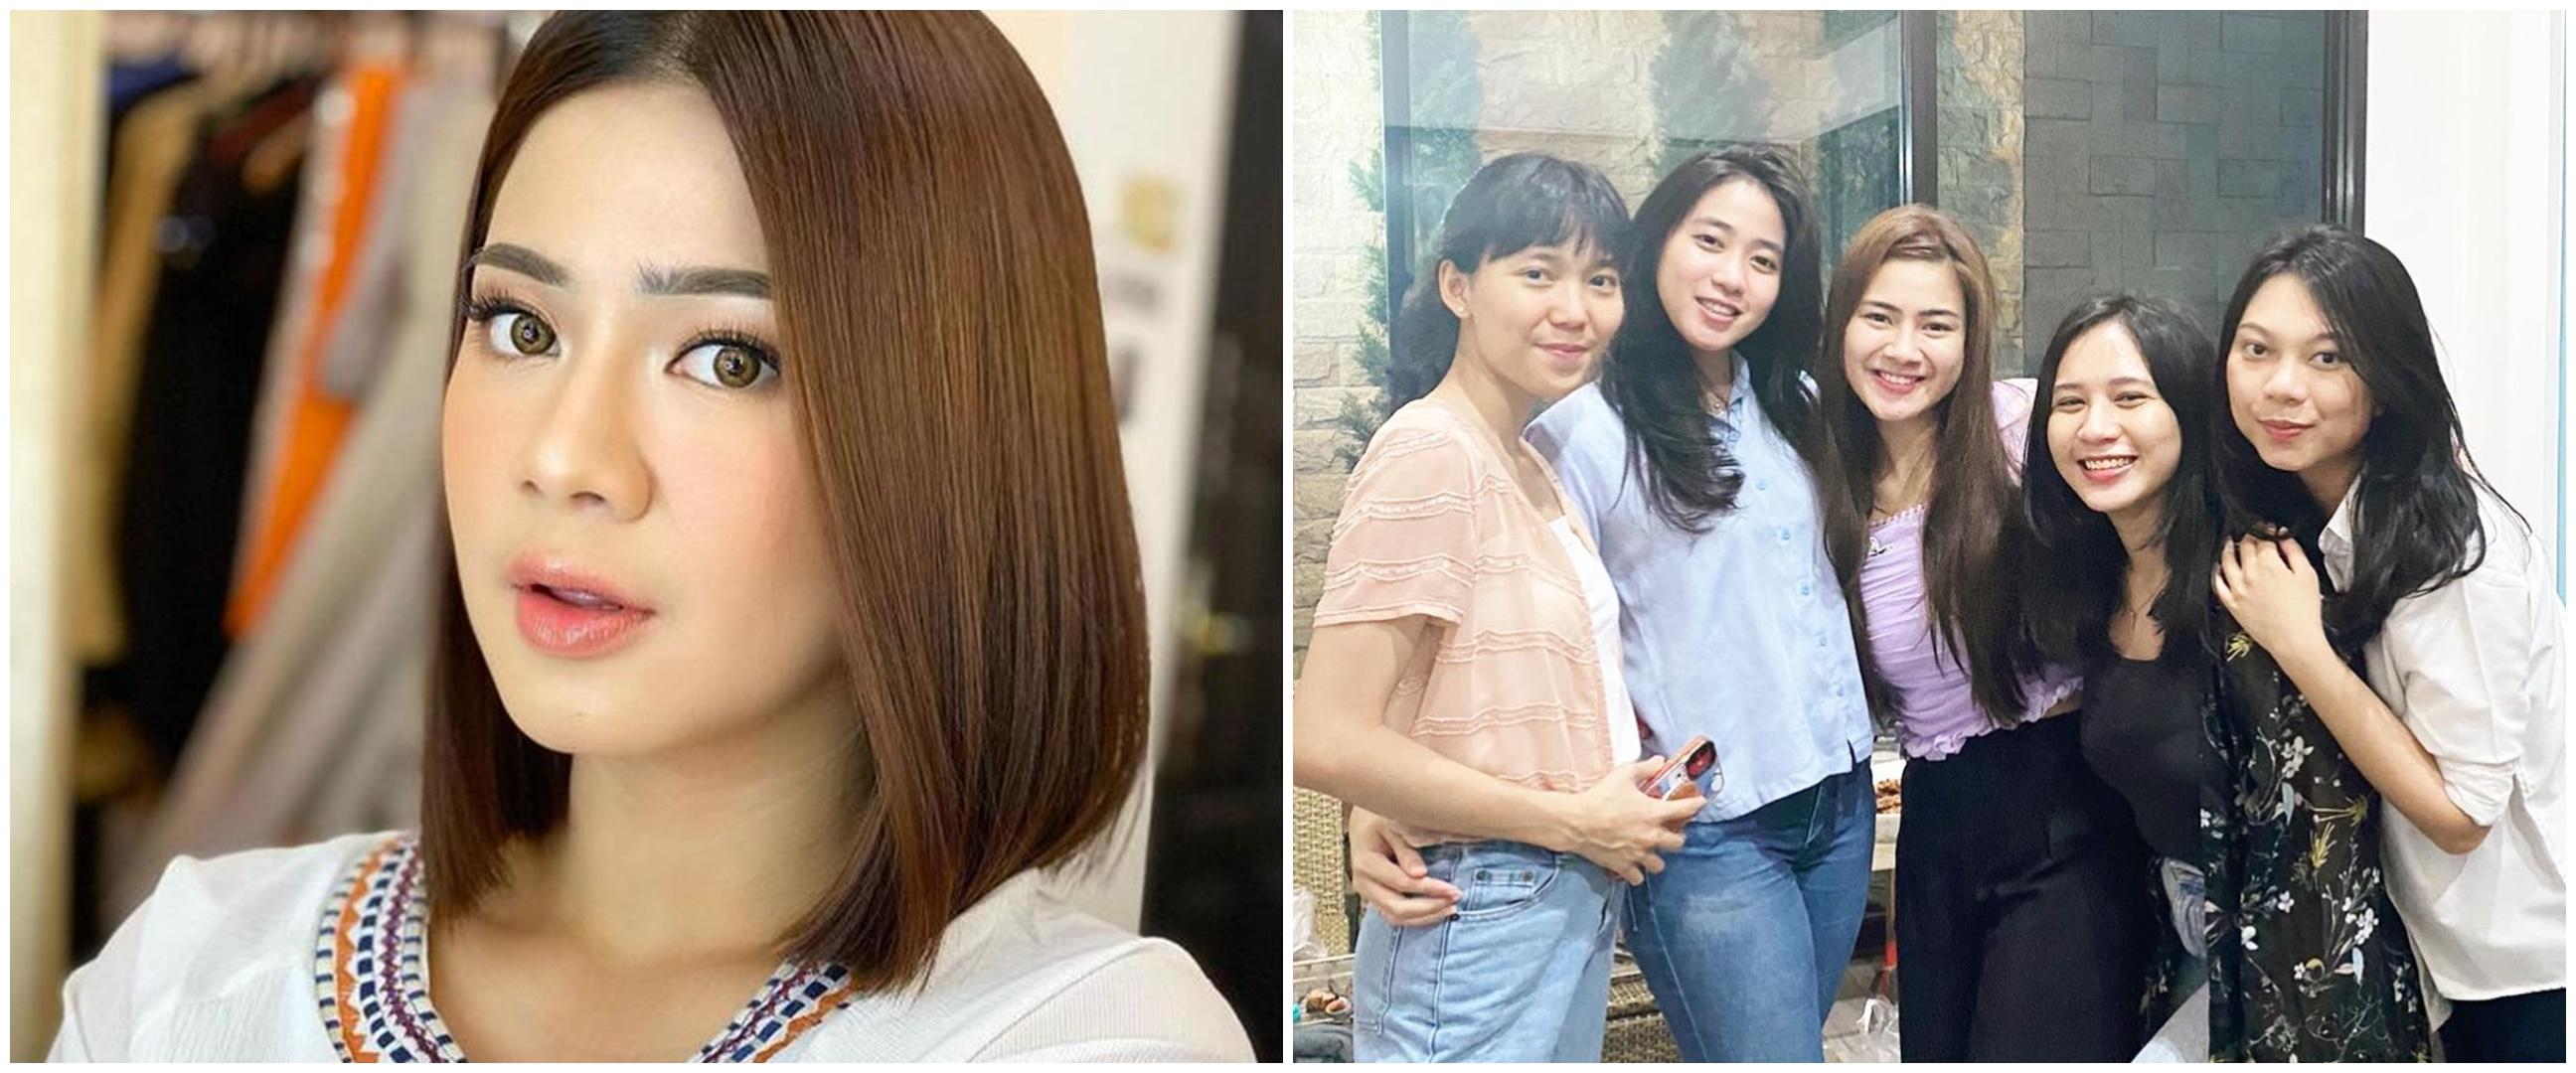 Felicya Angelista reka ulang foto saat SMP, gaya rambutnya konsisten